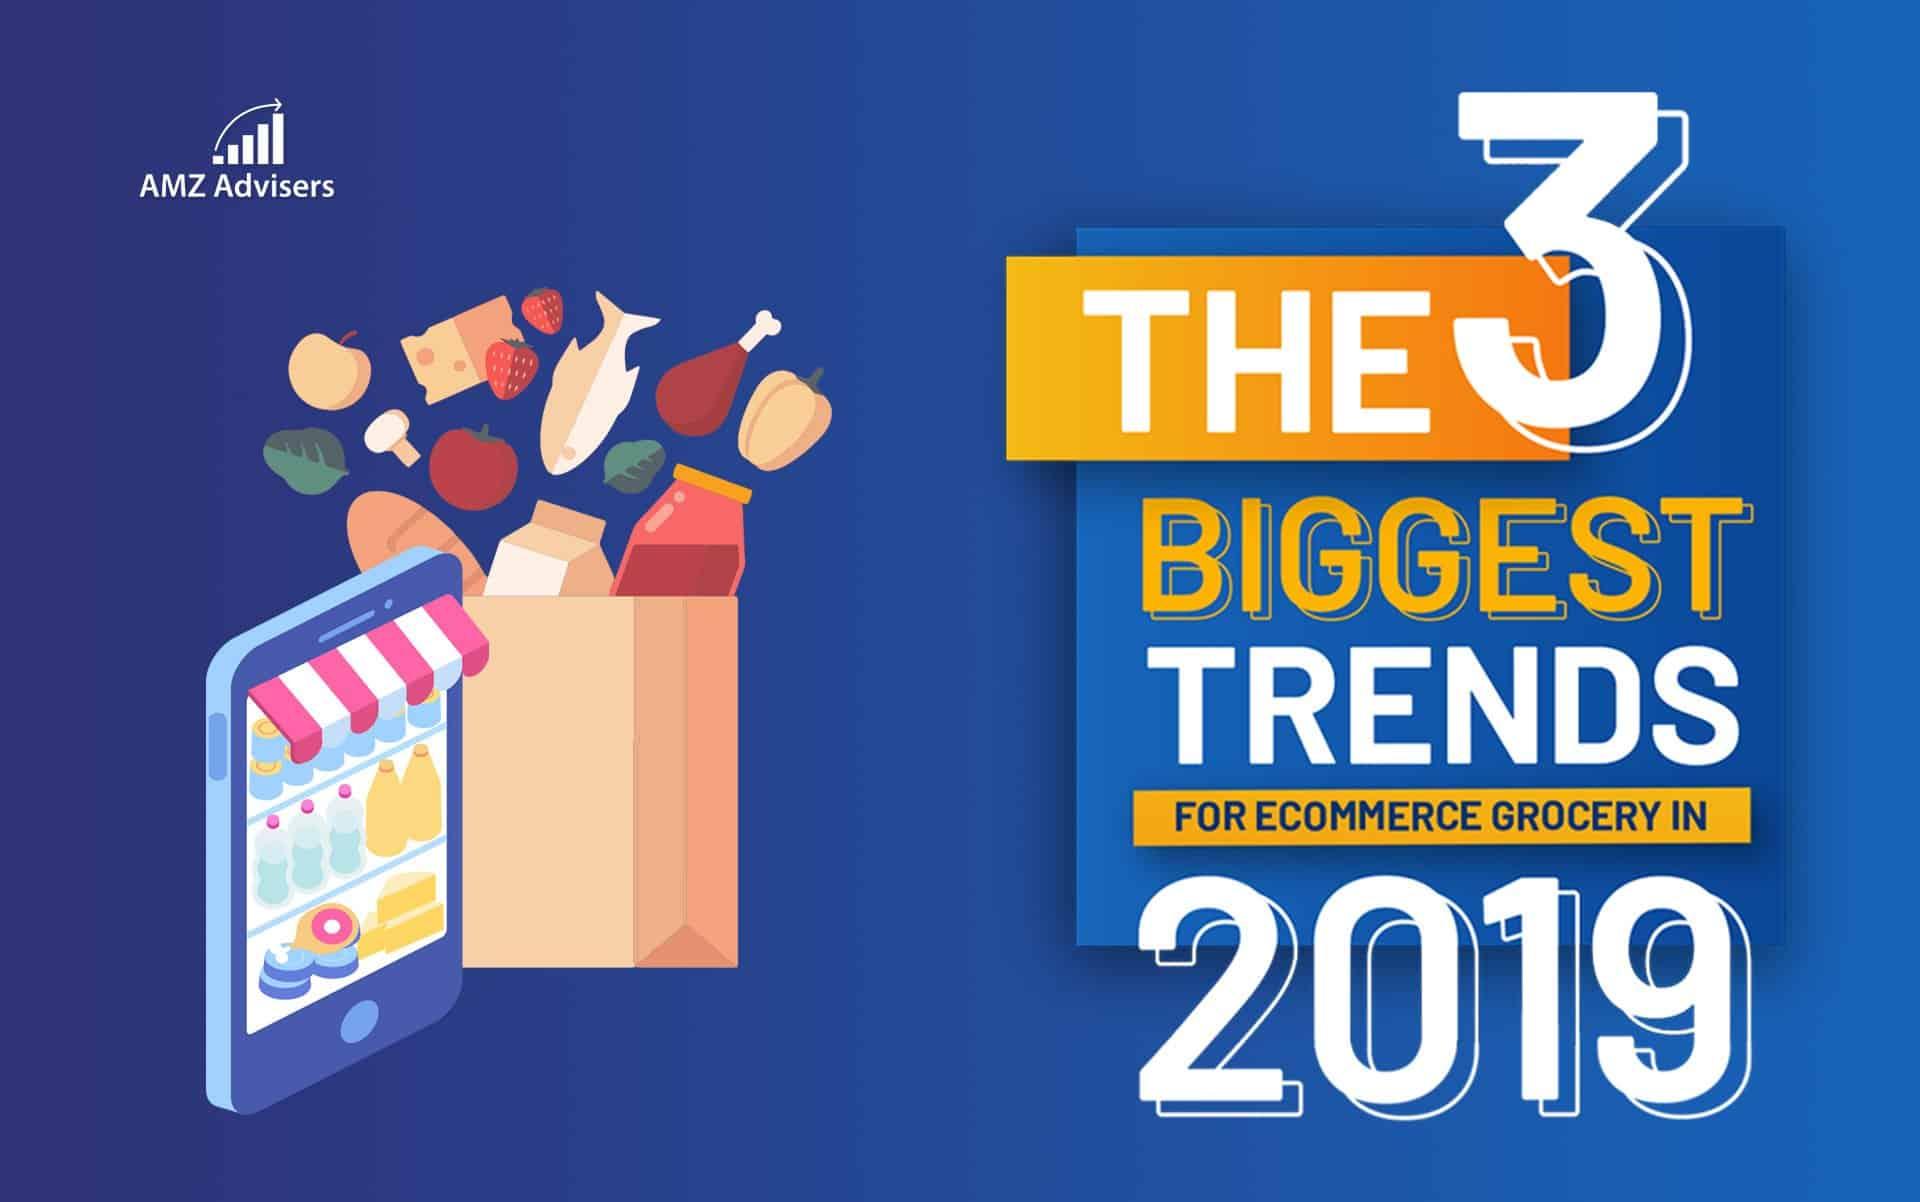 3-Biggest-Trends-Commerce-Grocery-2019.jpg